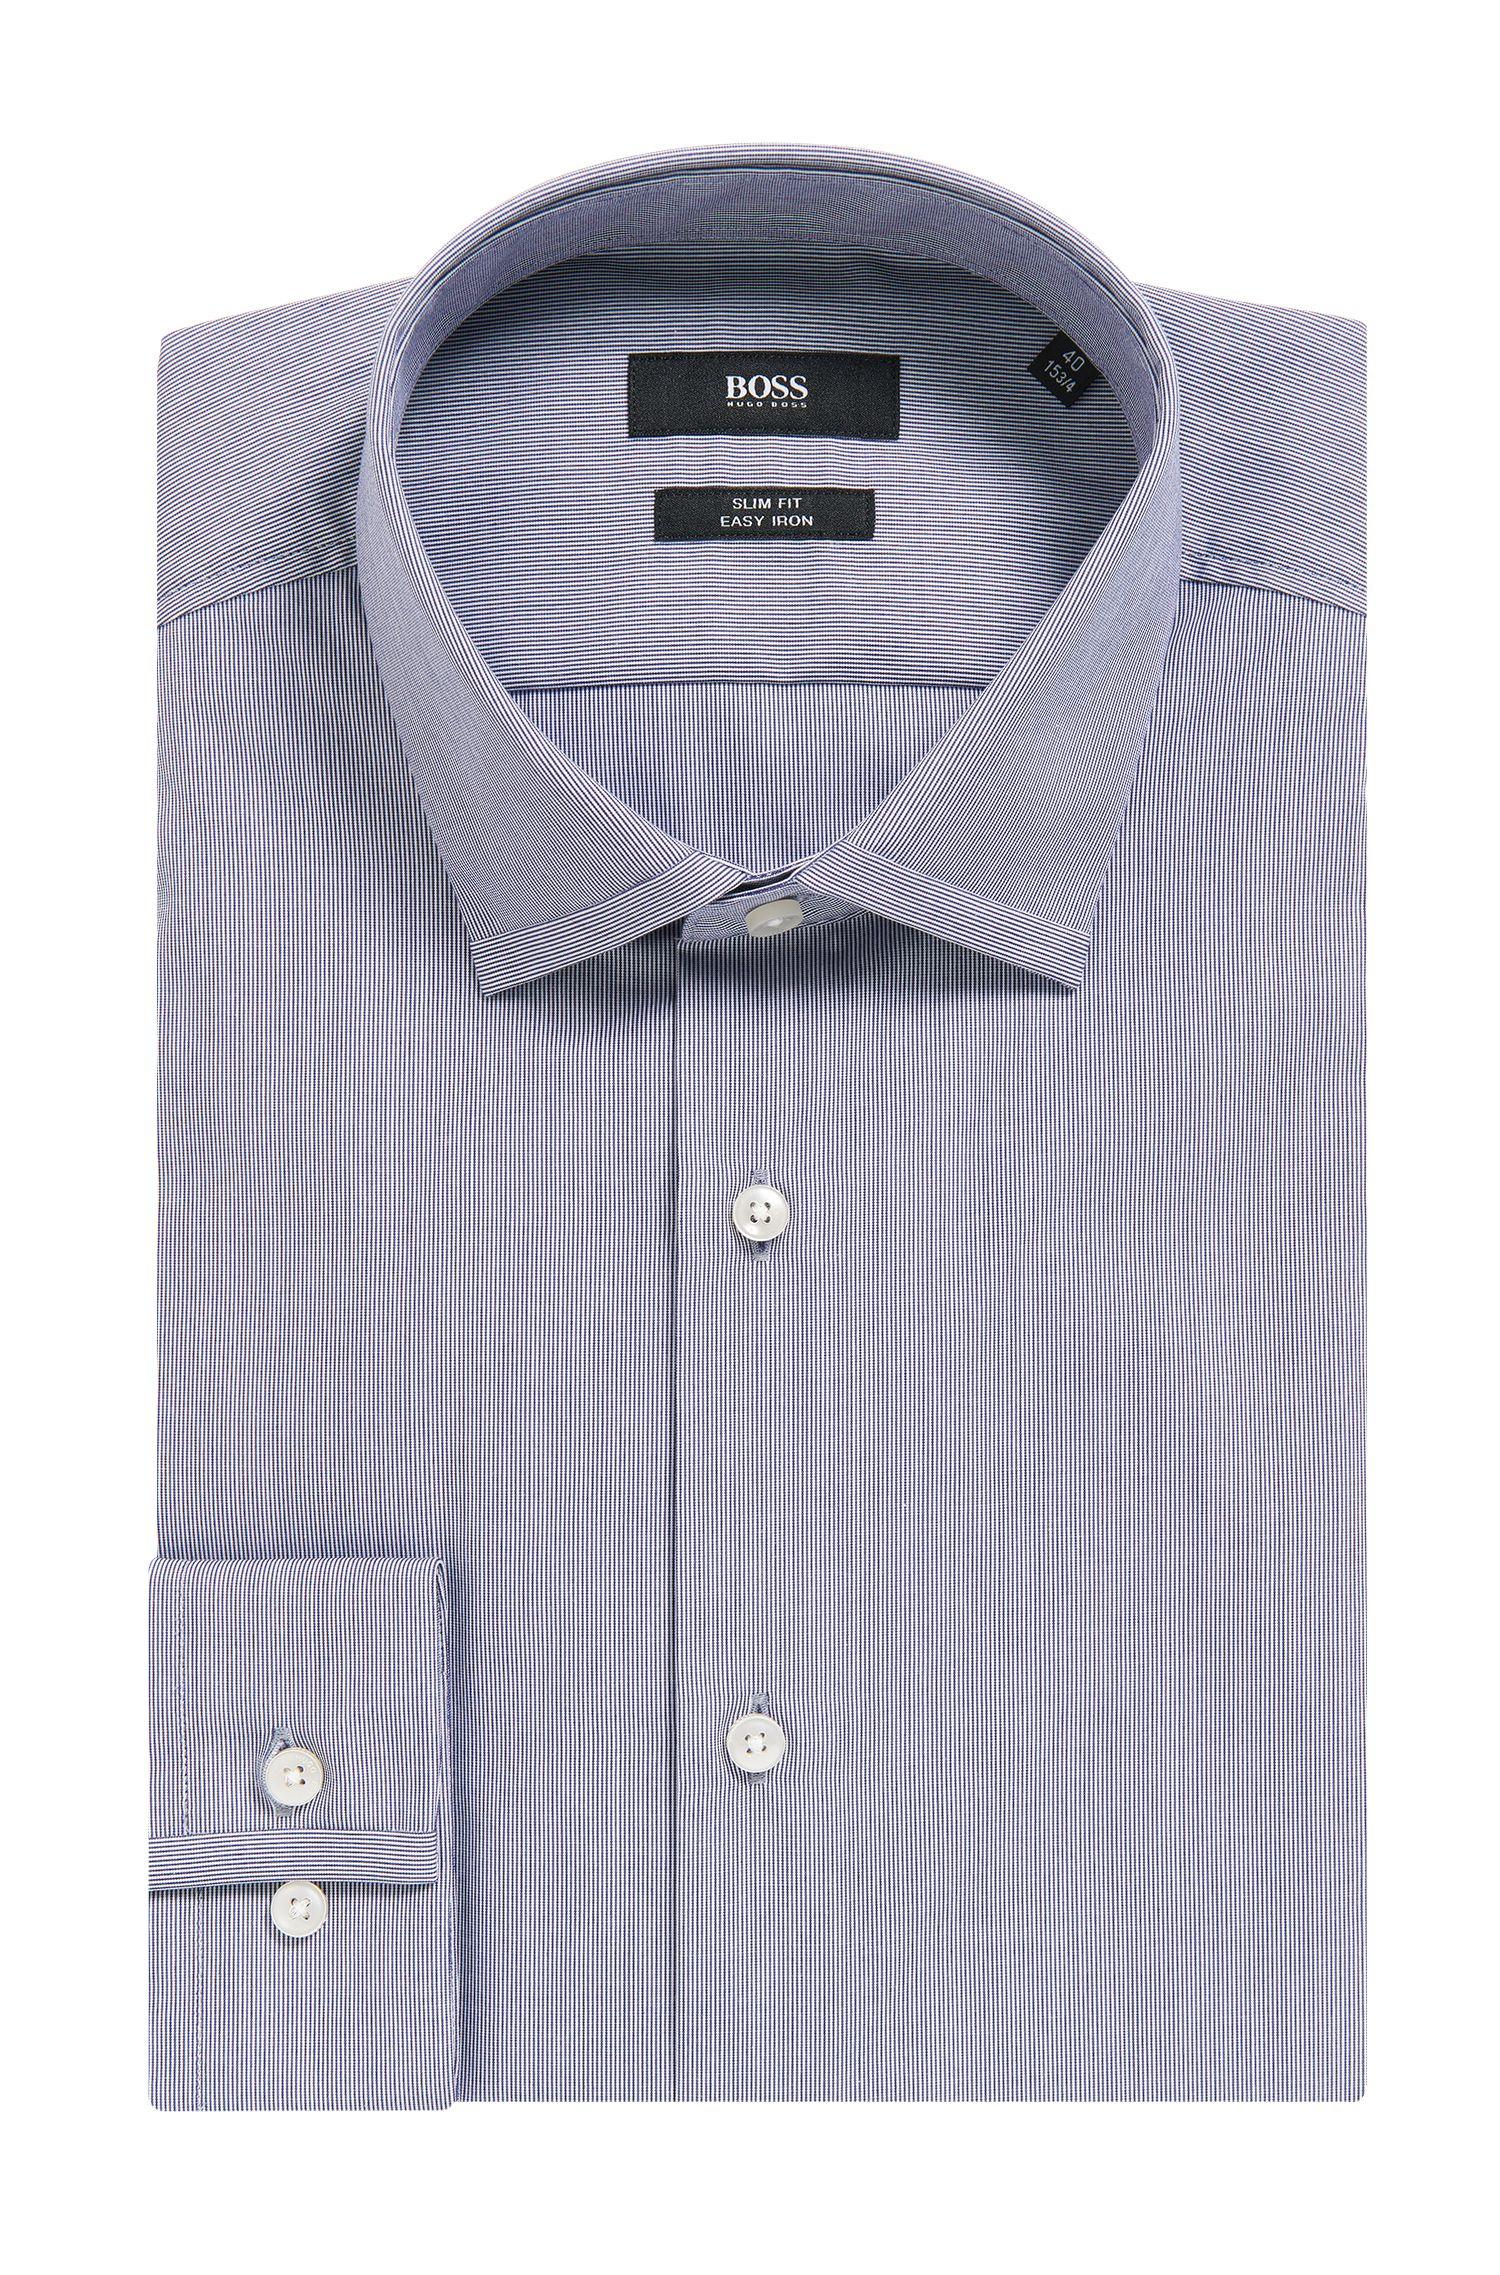 'Ismo' | Slim Fit, Microstriped Easy Iron Cotton Dress Shirt